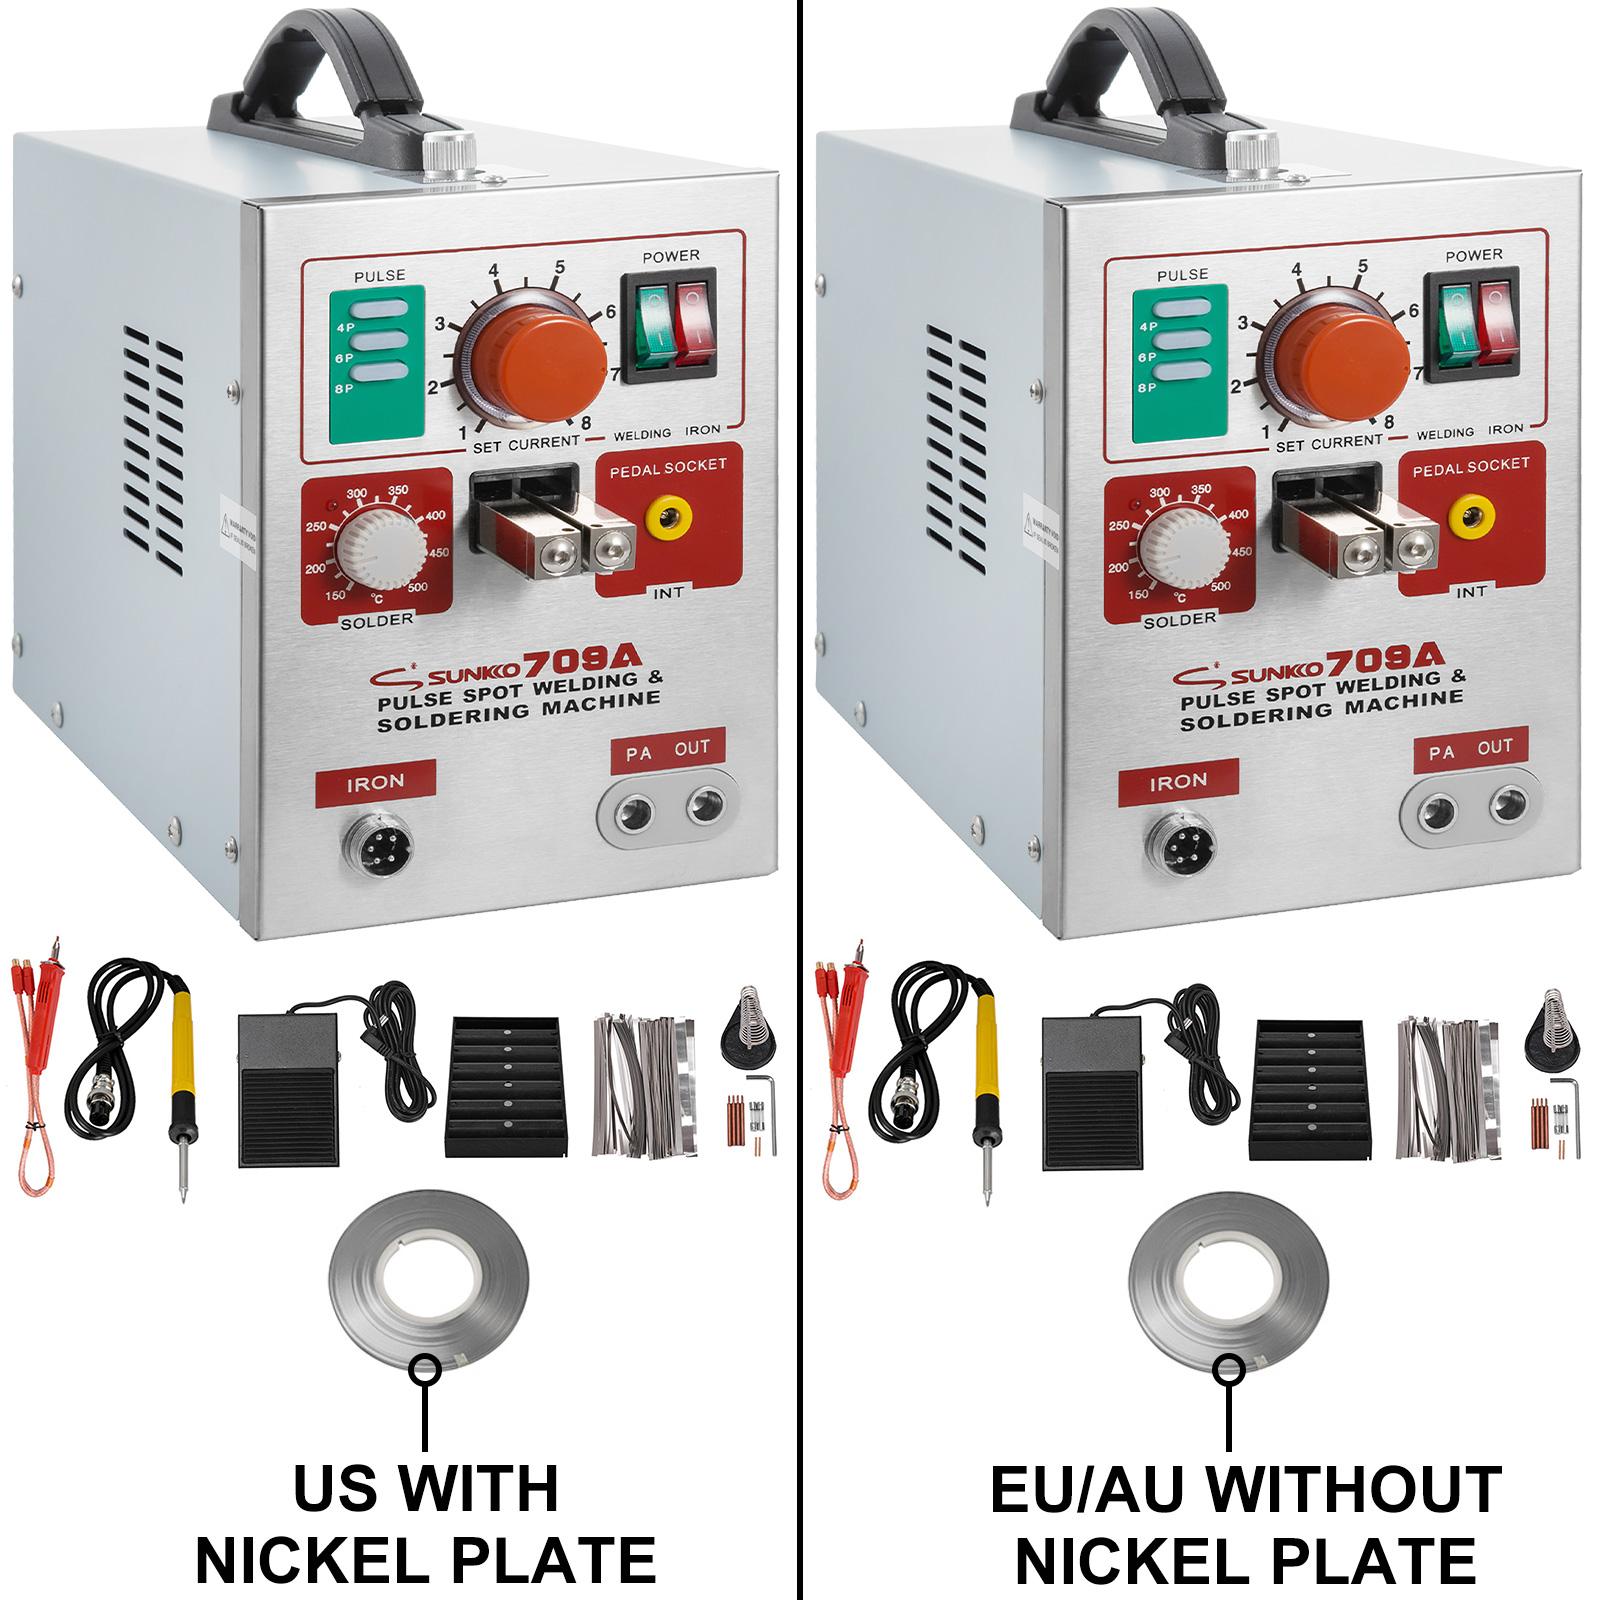 SUNKKO Pulse Spot Welder for 18650 Battery Welding Soldering Machine 737G 709A……